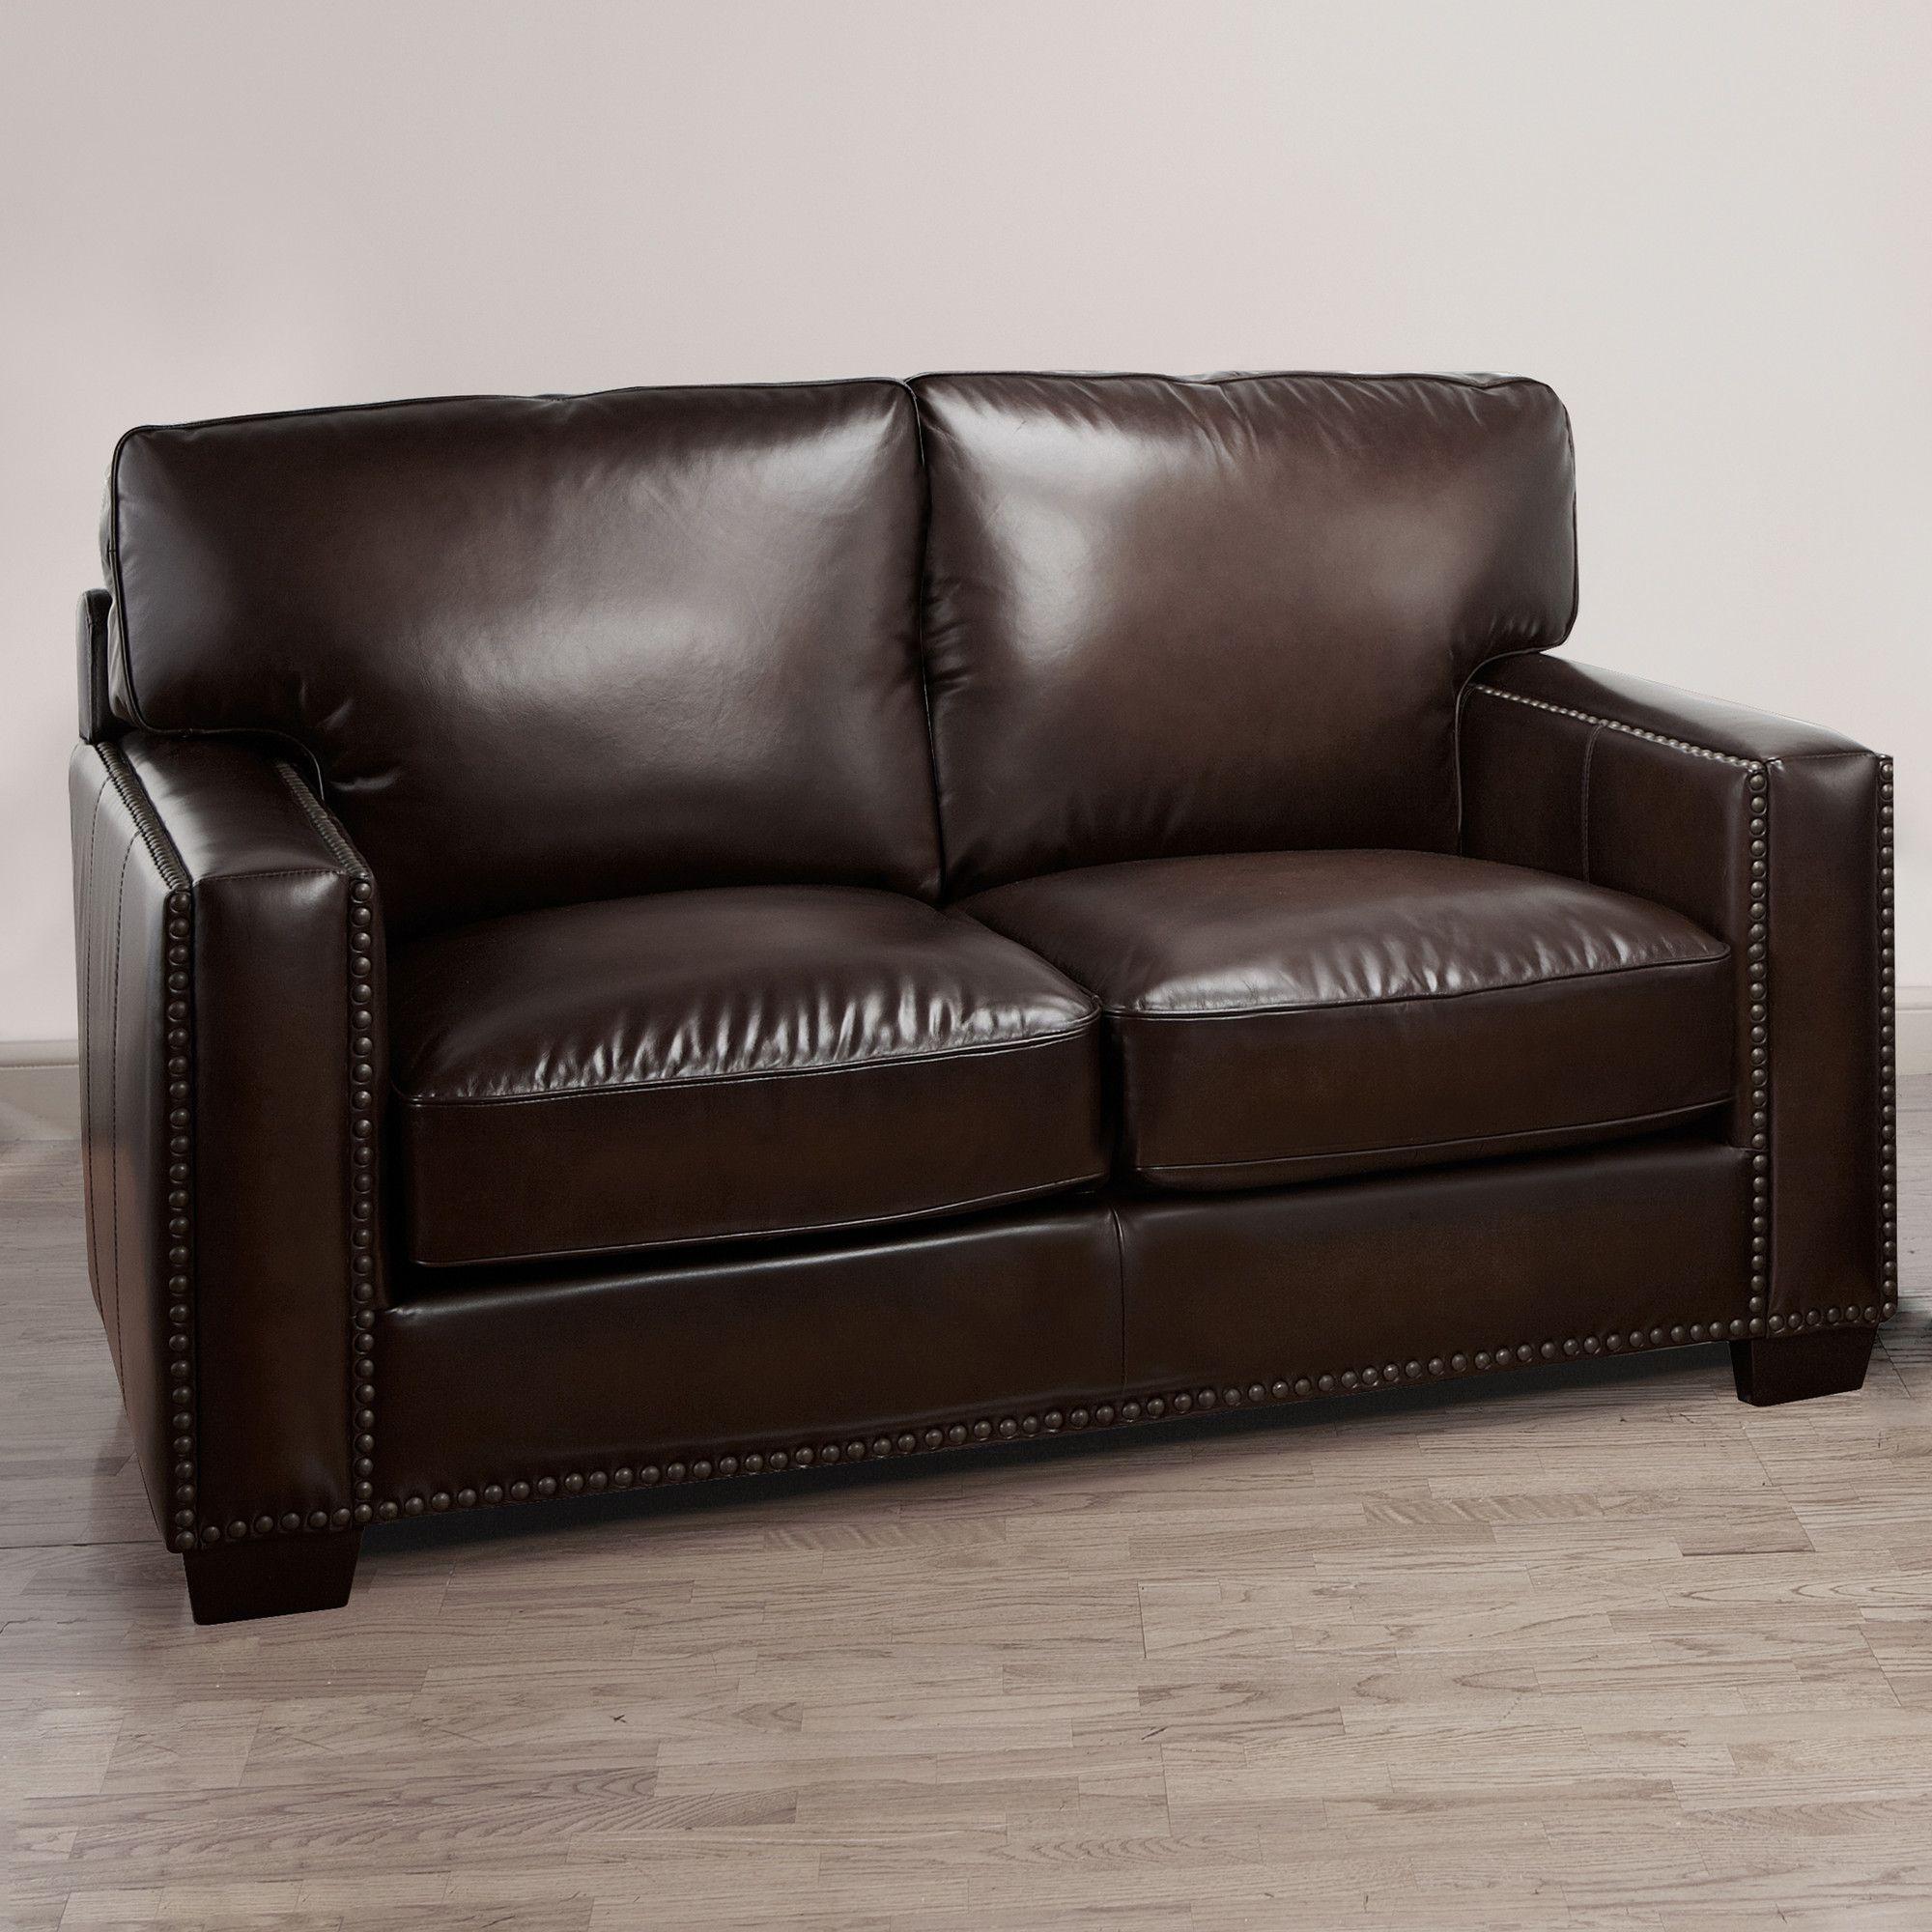 Decoro Campaign Stationary Leather Loveseat Loveseats Best Sofa